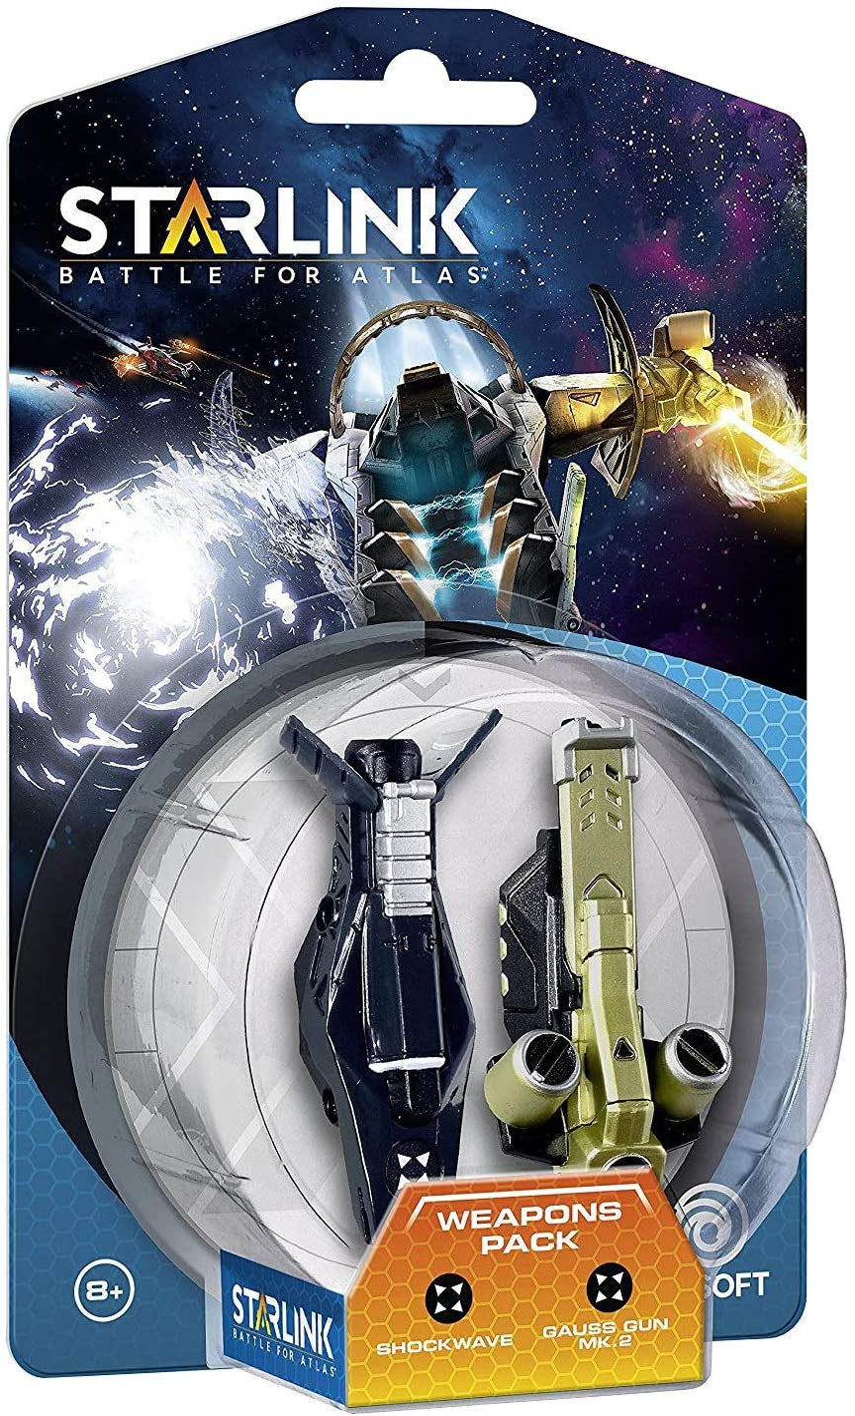 Starlink - Battle For Atlas, Pack De Armas Shockwave + Gauss